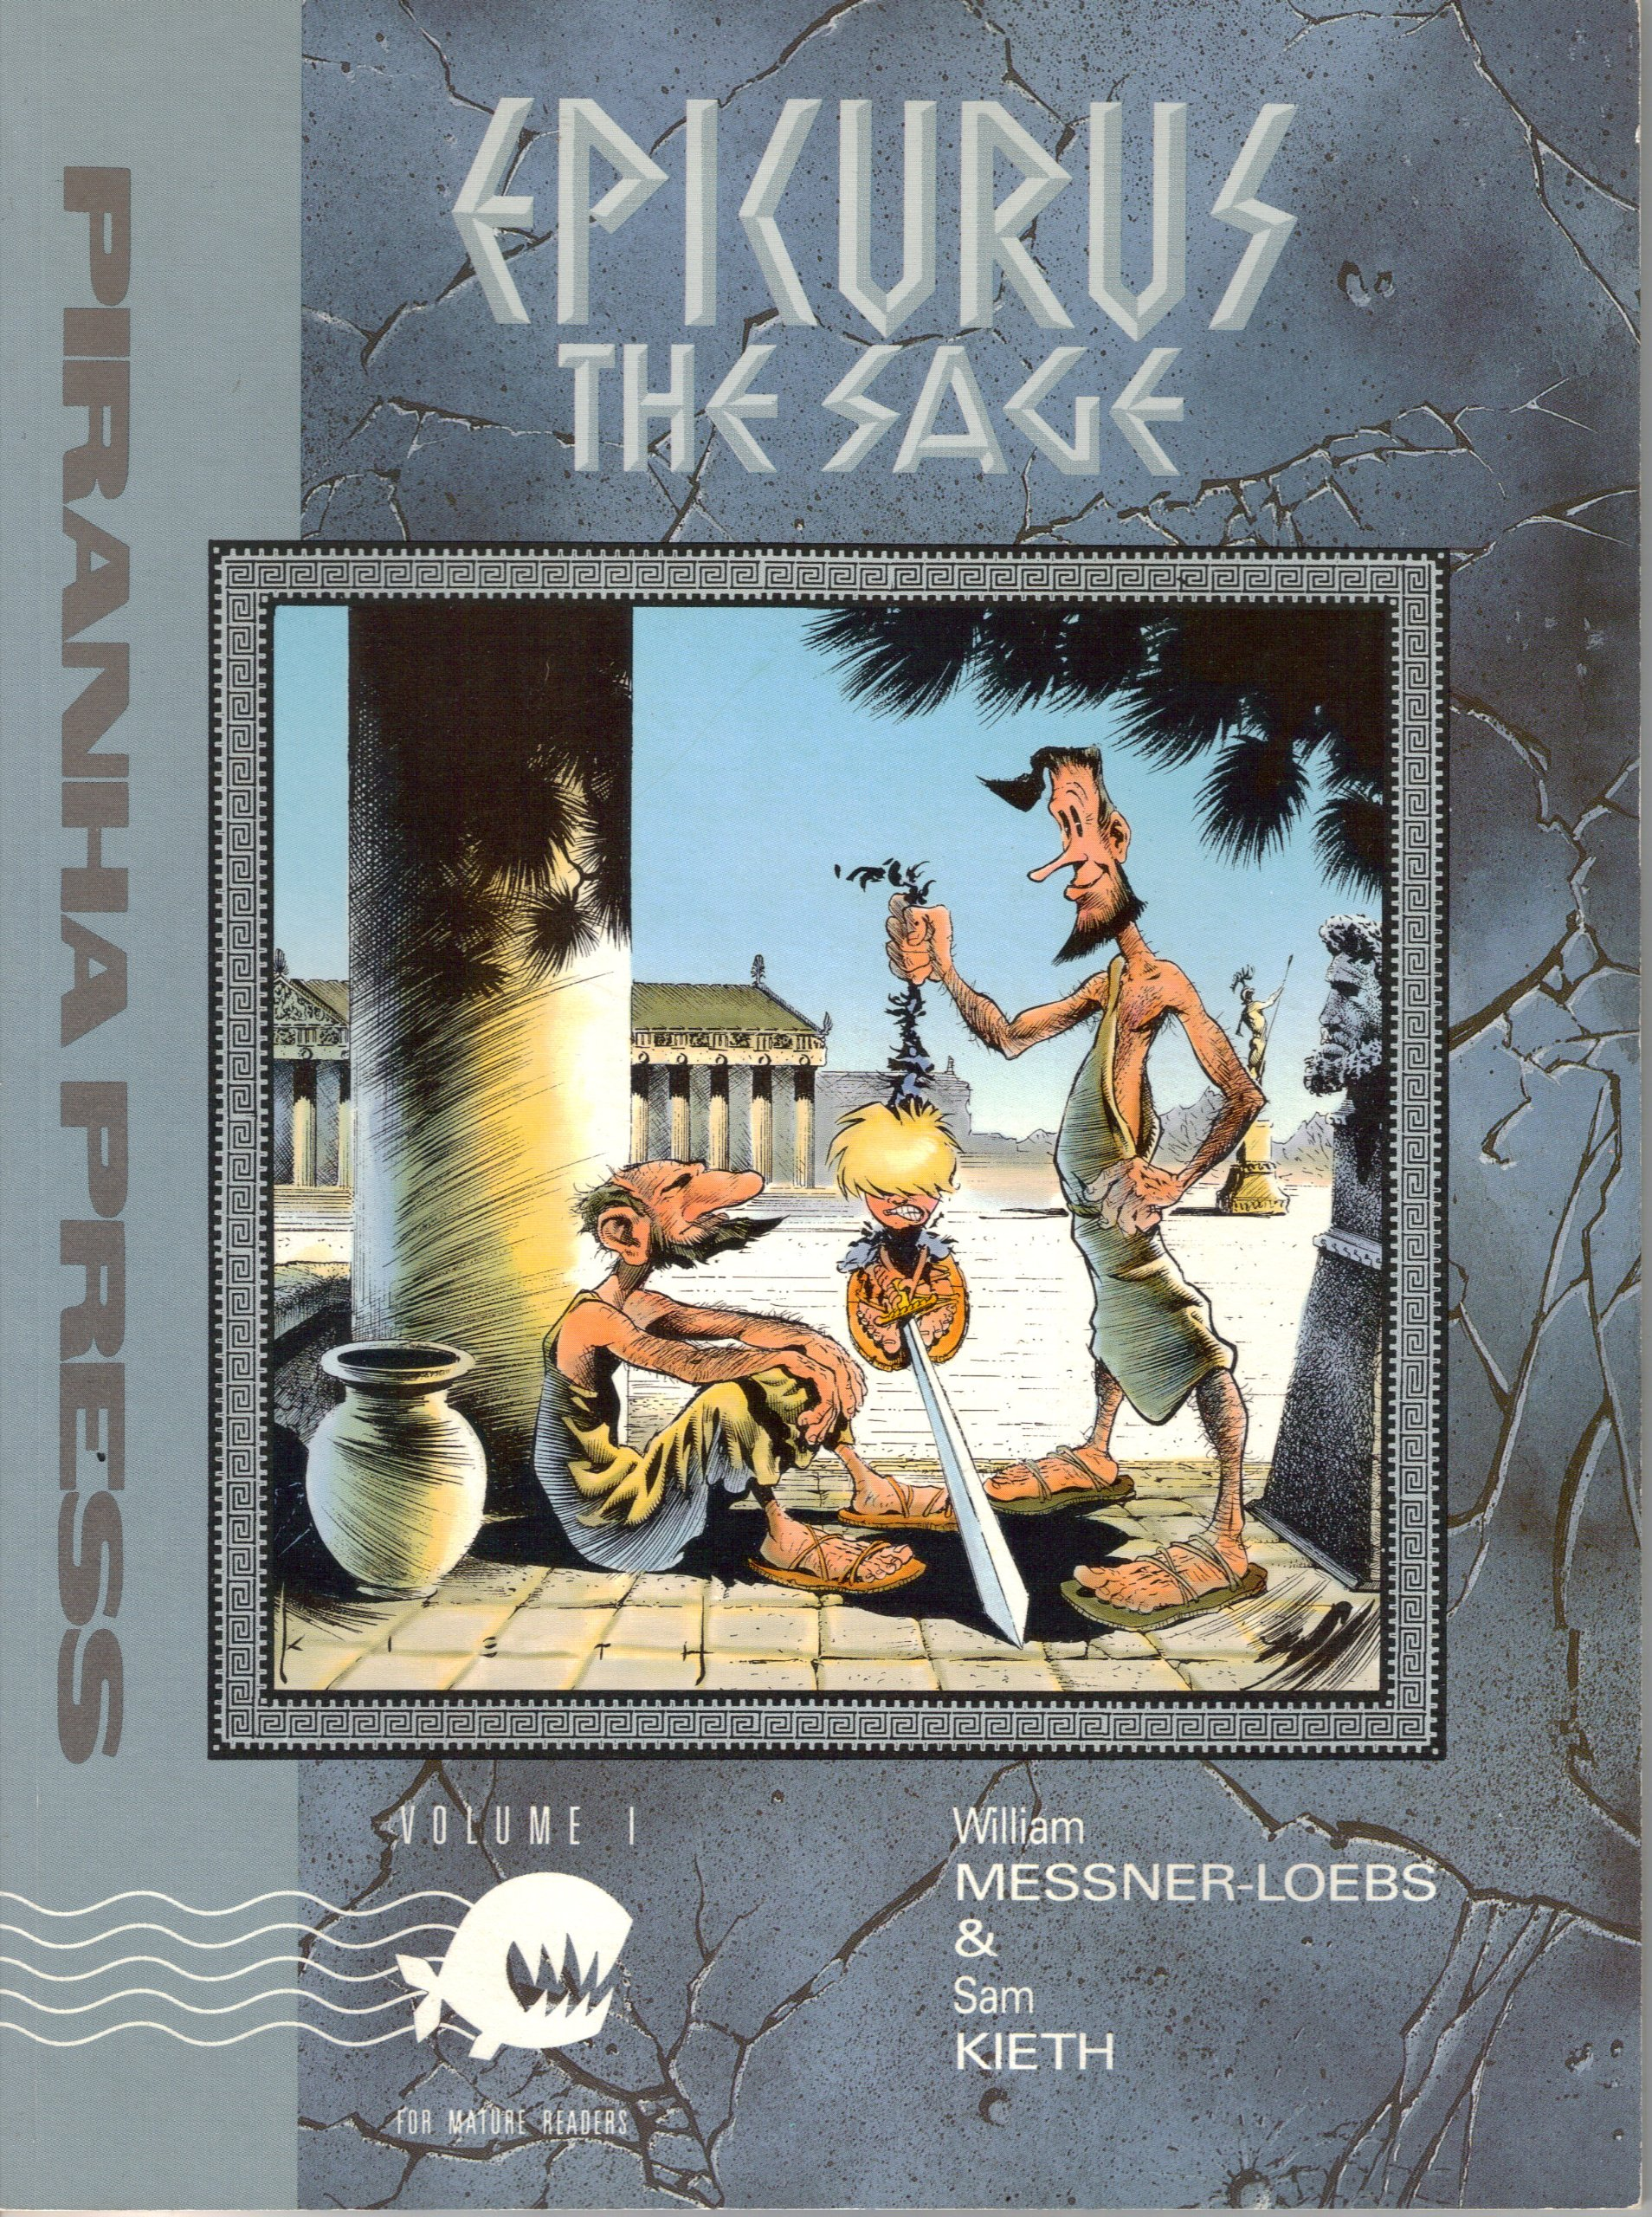 Epicurus the Sage Vol 1